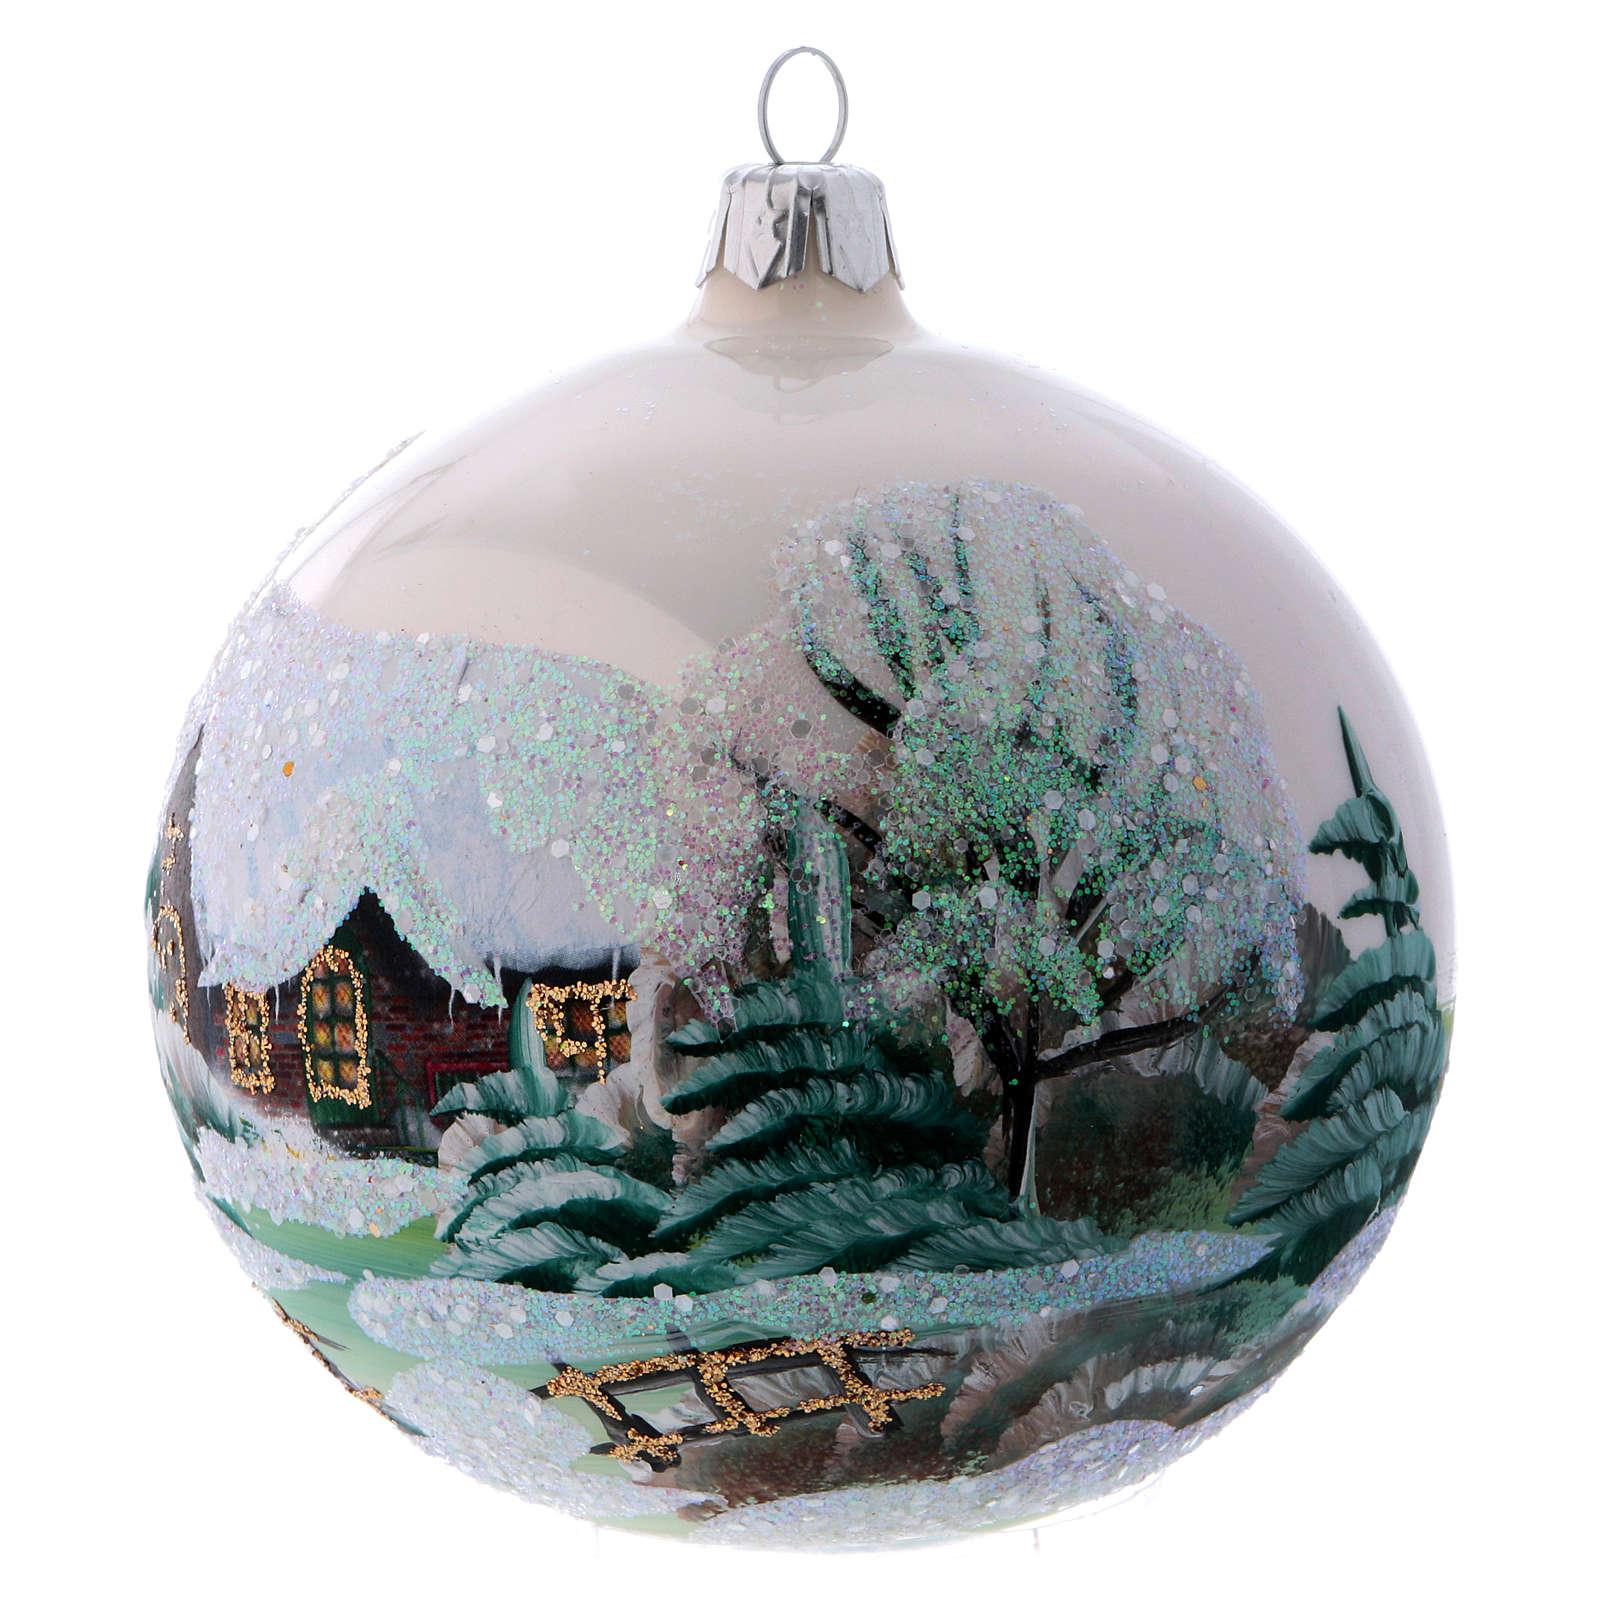 Décoration sapin Noël 100 mm blanc et strass 4